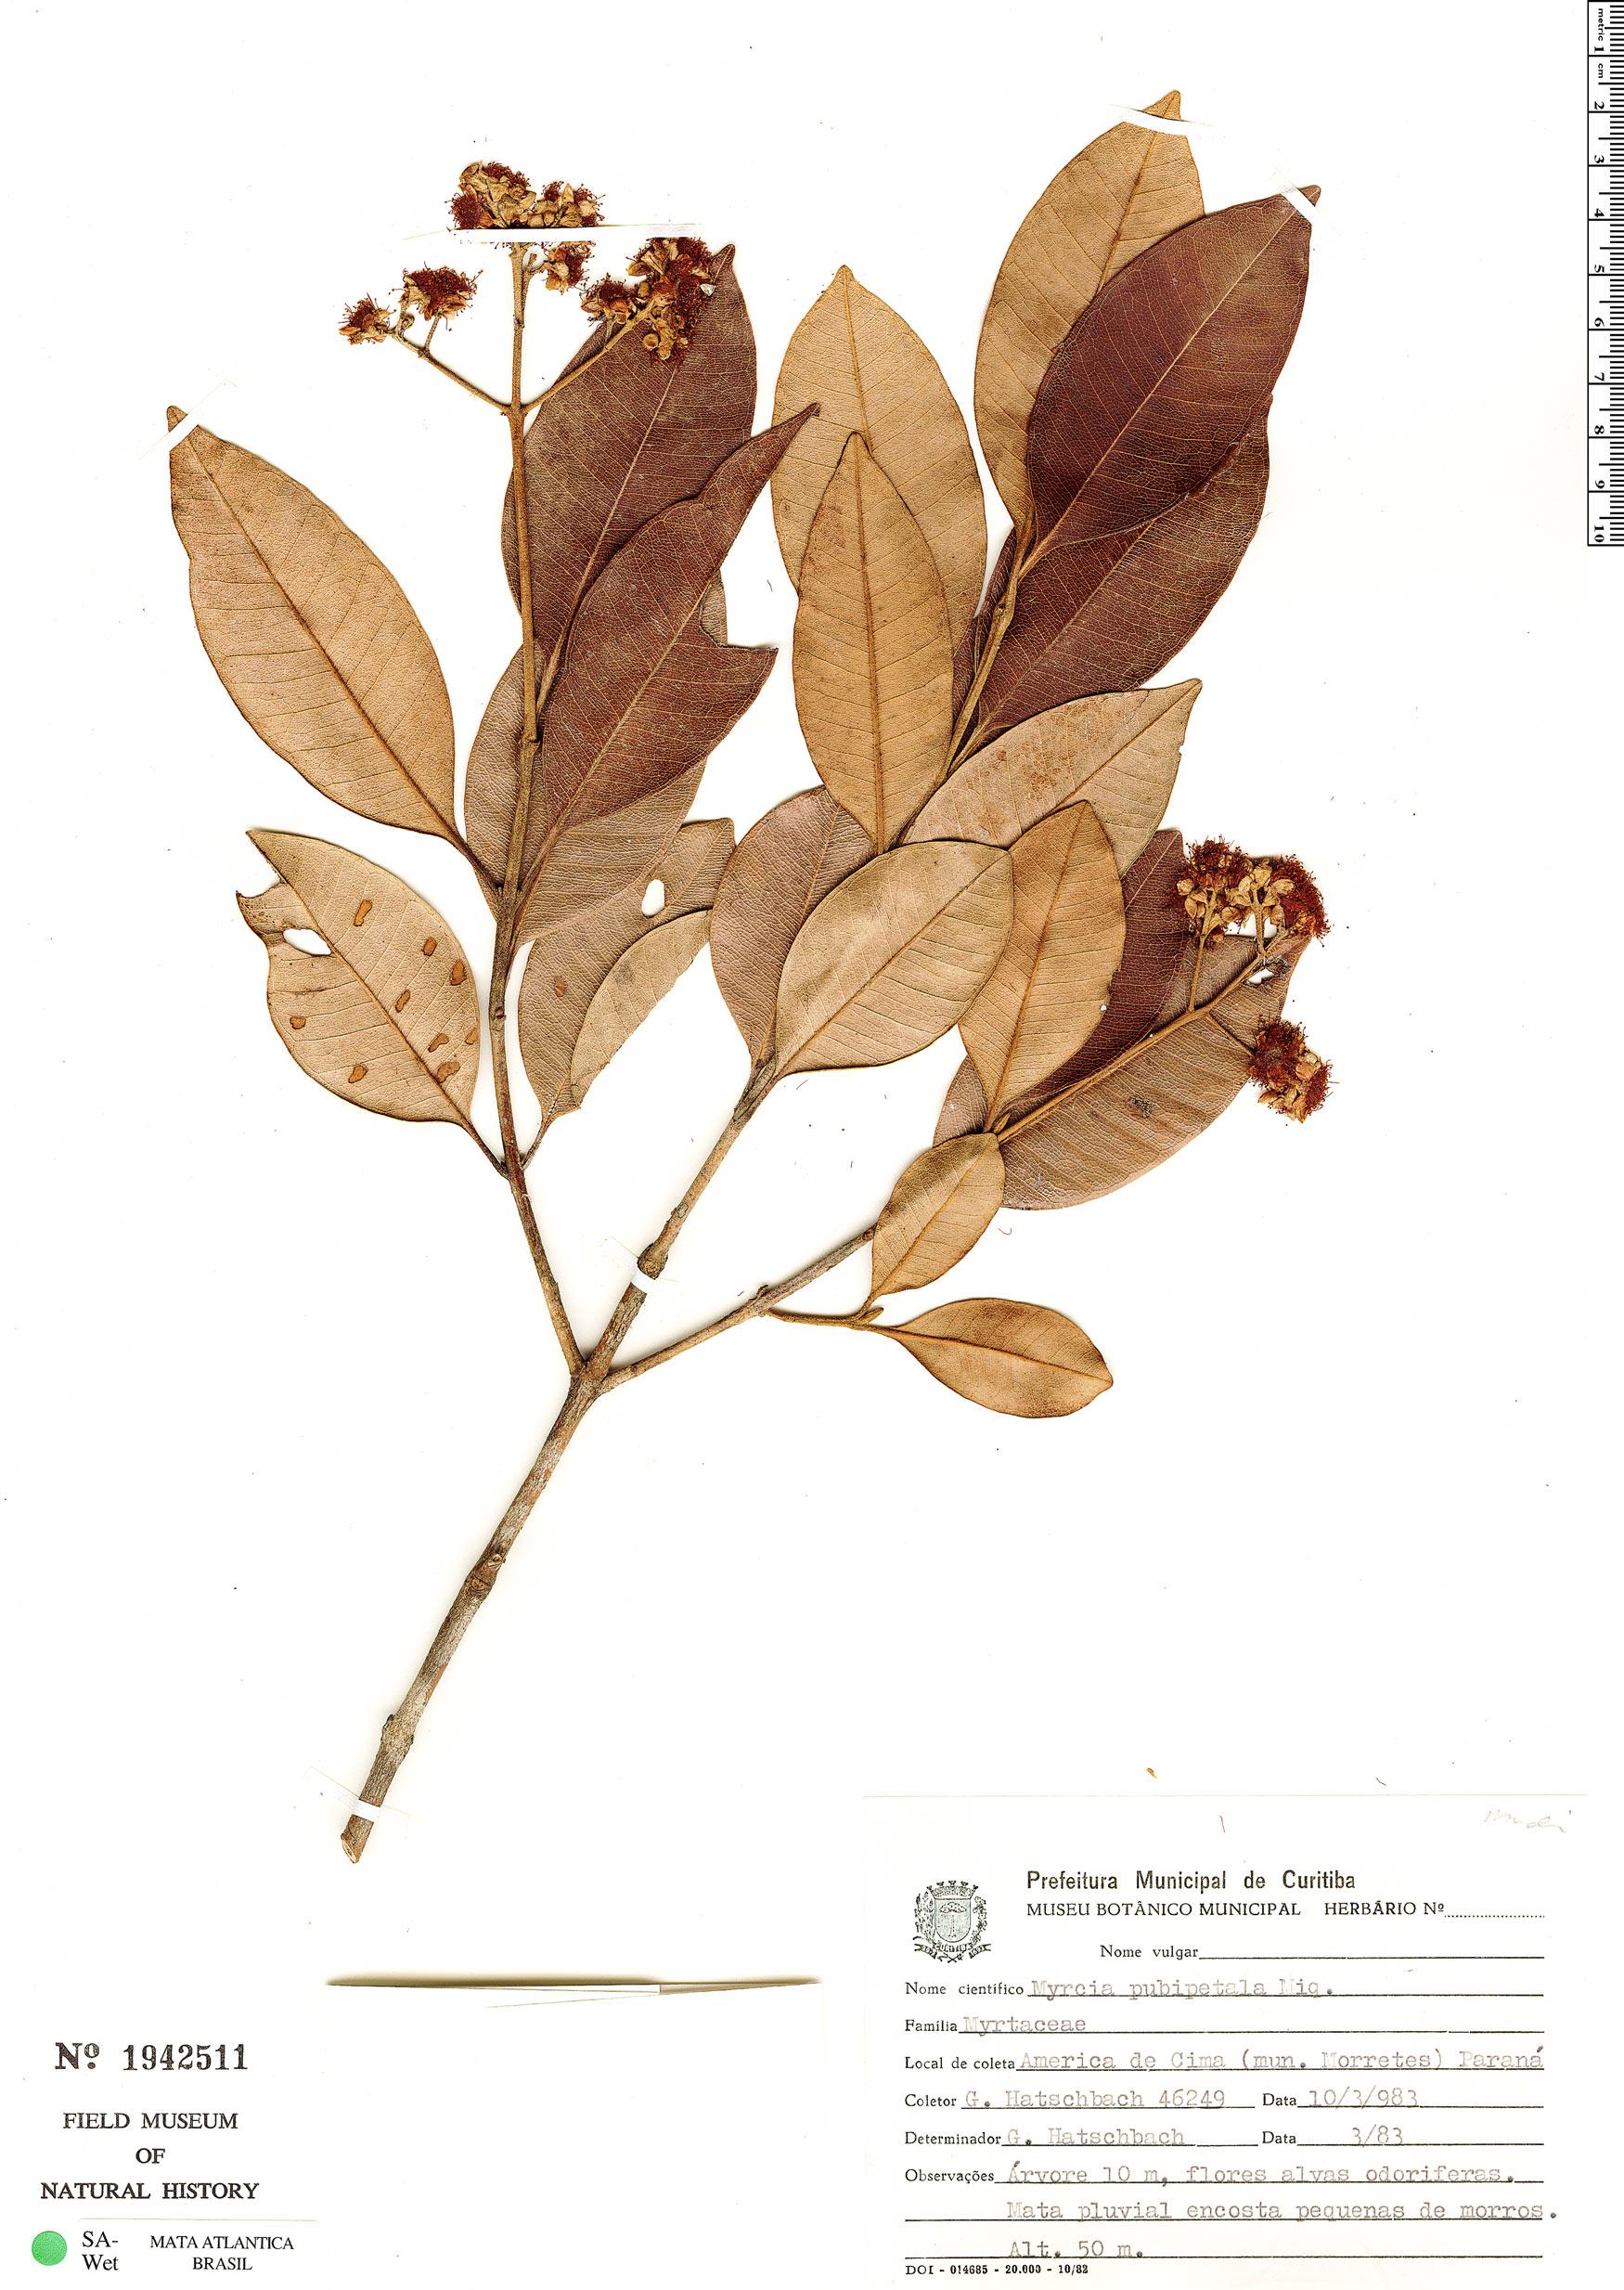 Specimen: Myrcia pubipetala